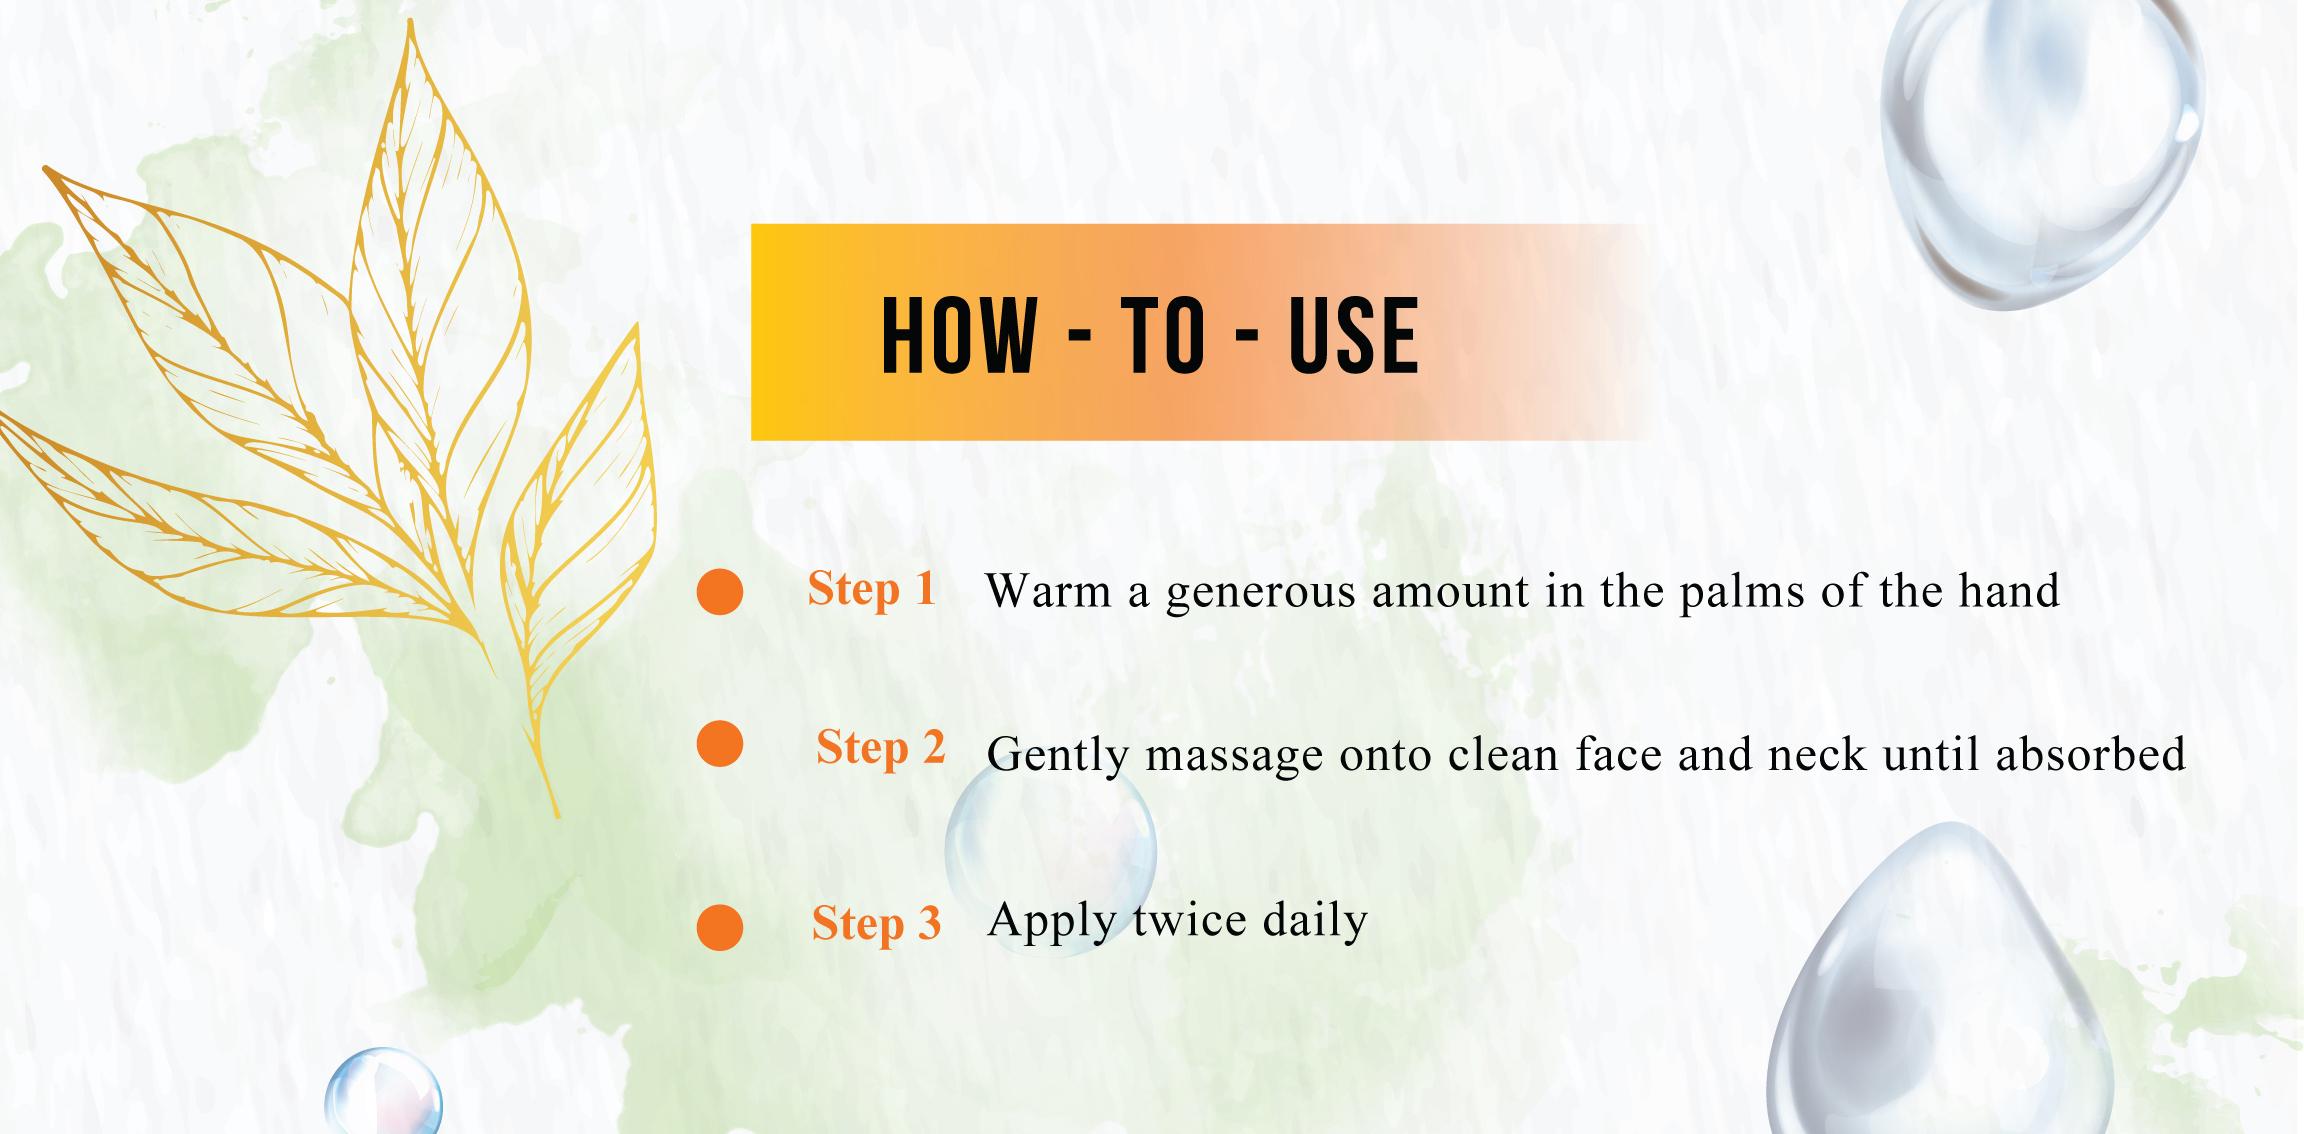 moisturizer-how-to-use